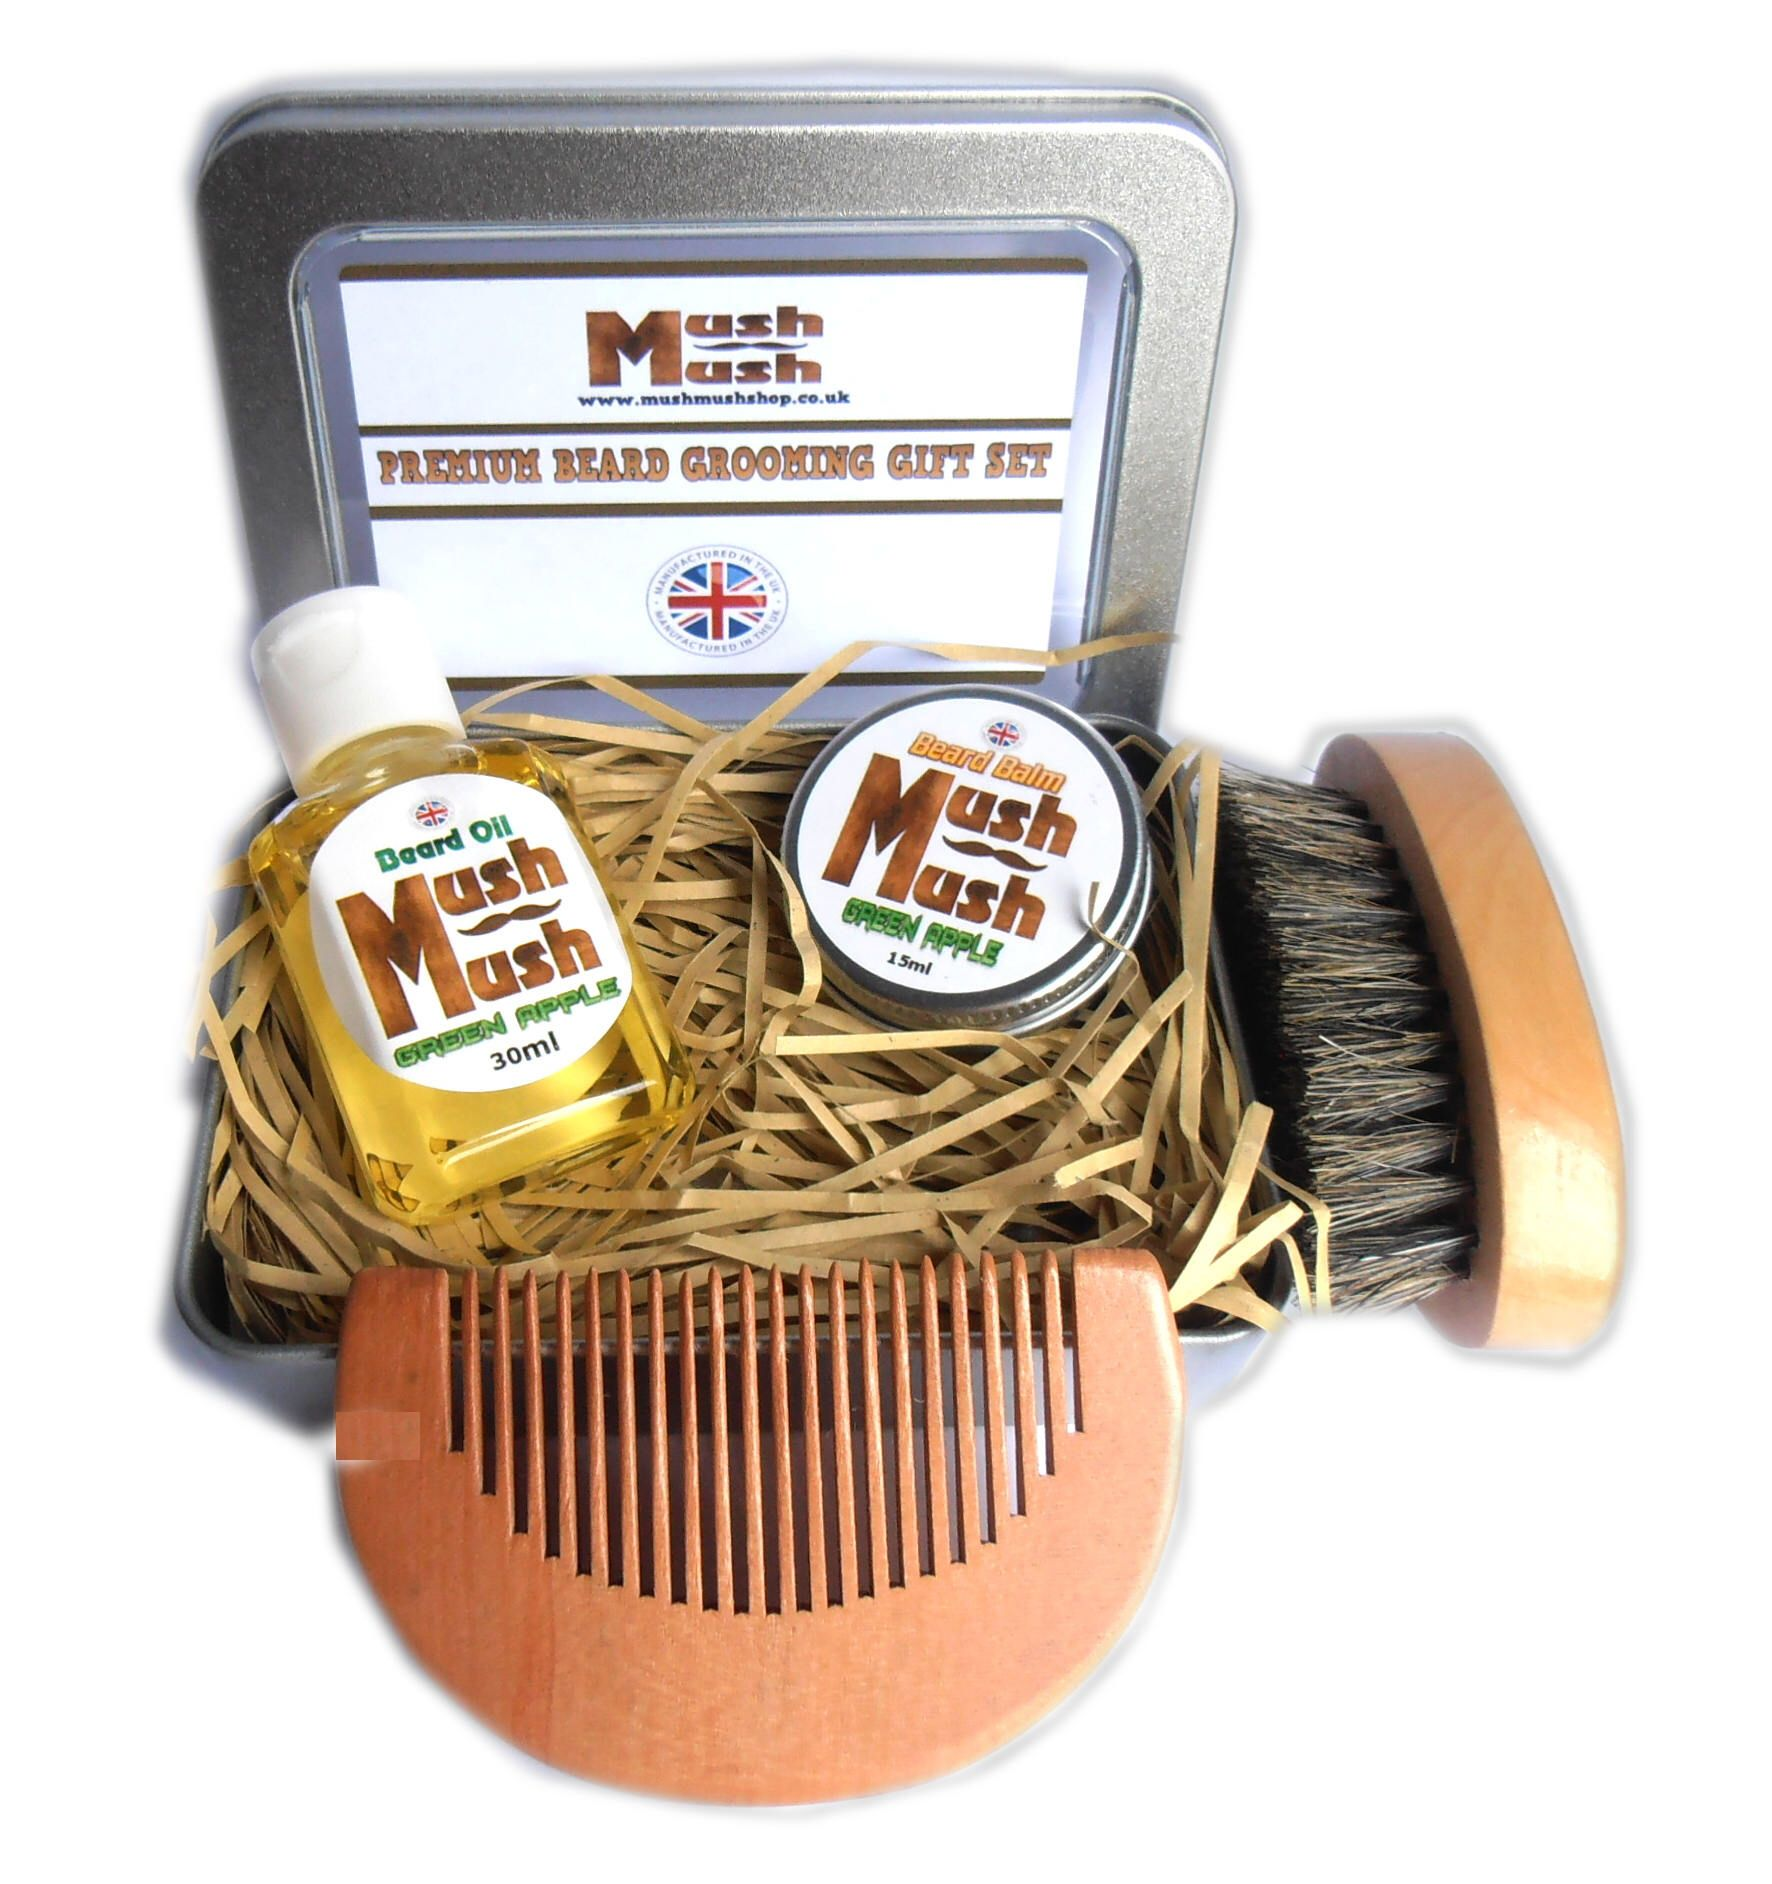 Beard Grooming Gift Set, Beard Oil, Balm, Beard Brush and